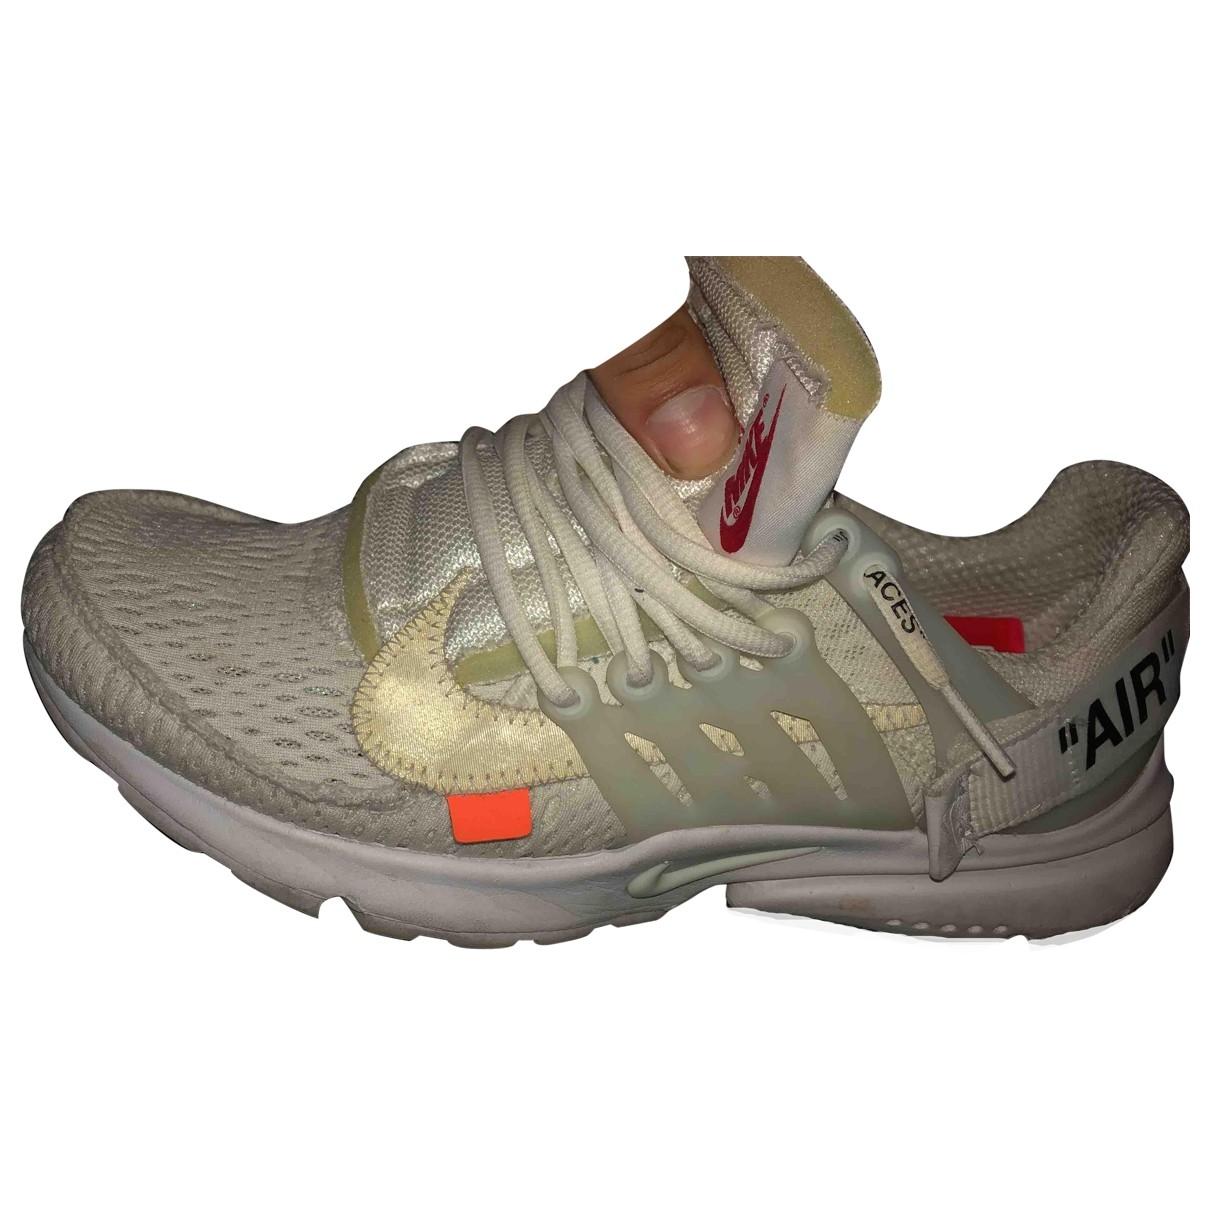 Nike X Off-white Air Presto White Cloth Trainers for Men 8 US